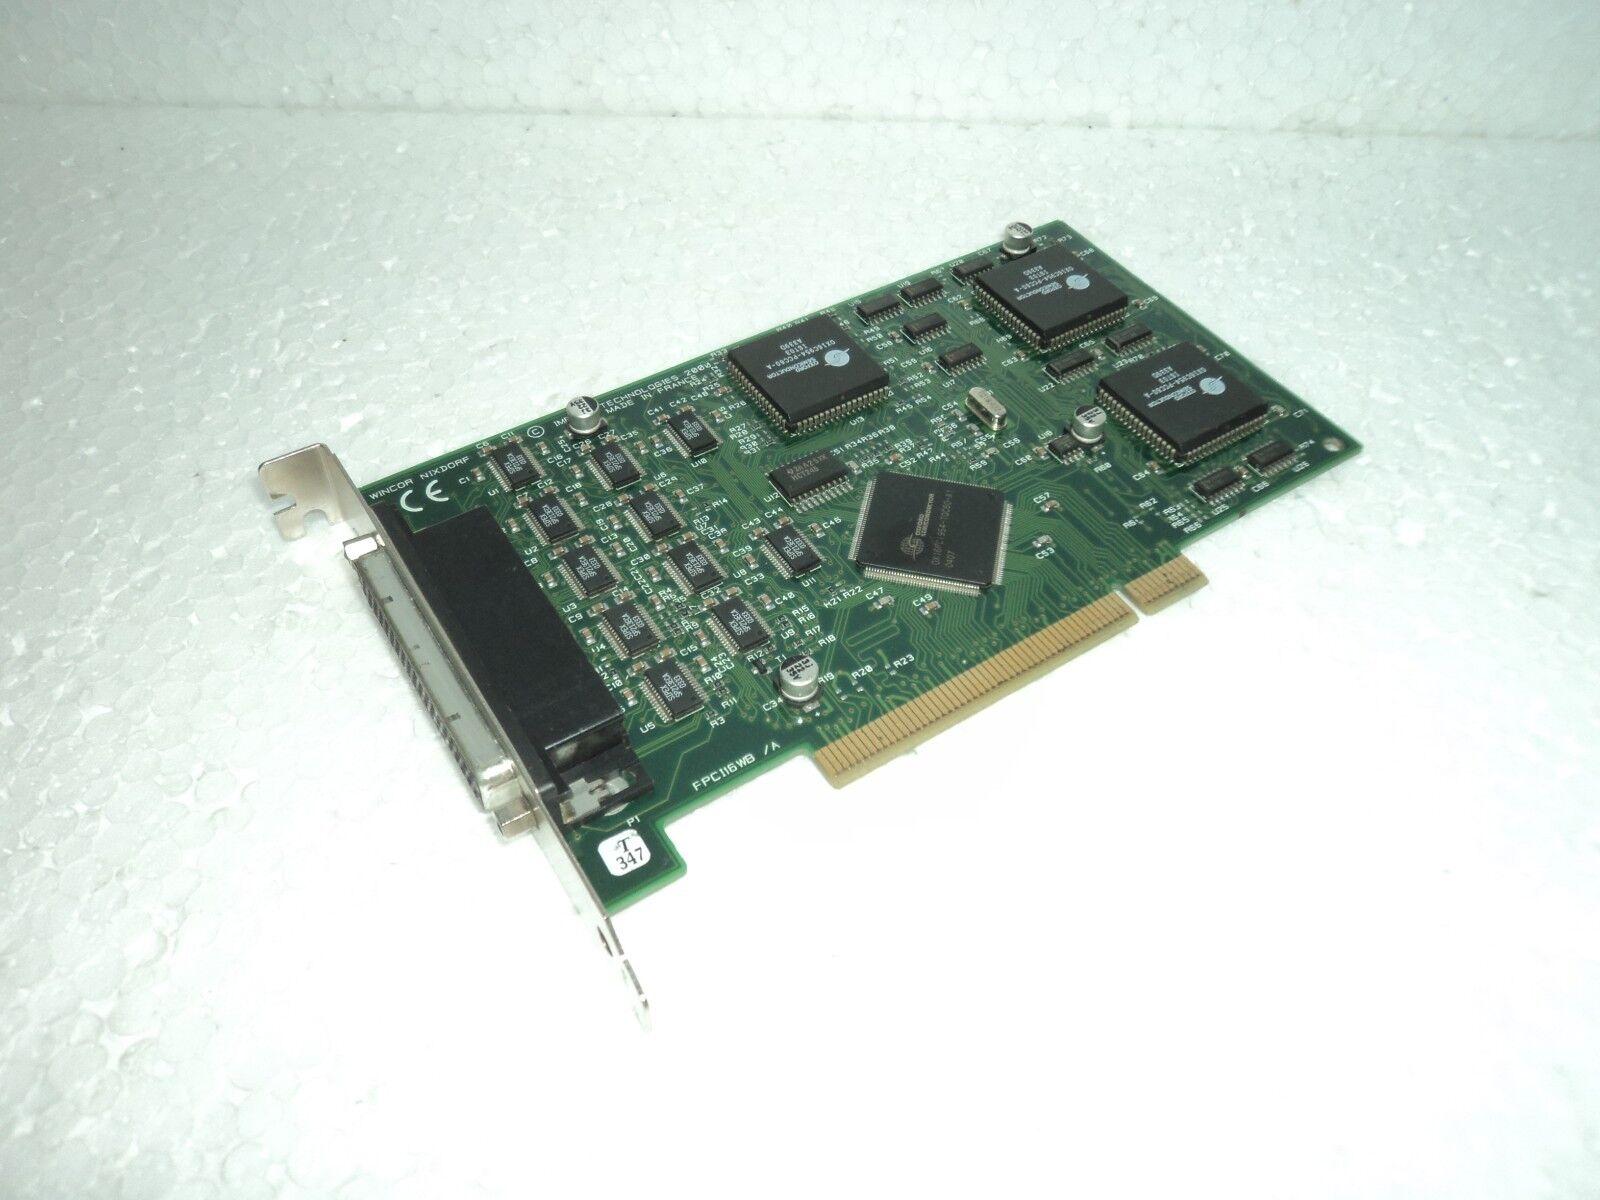 WINCOR NIXDORF Impact Technologies FPCl16WB A PCI Card